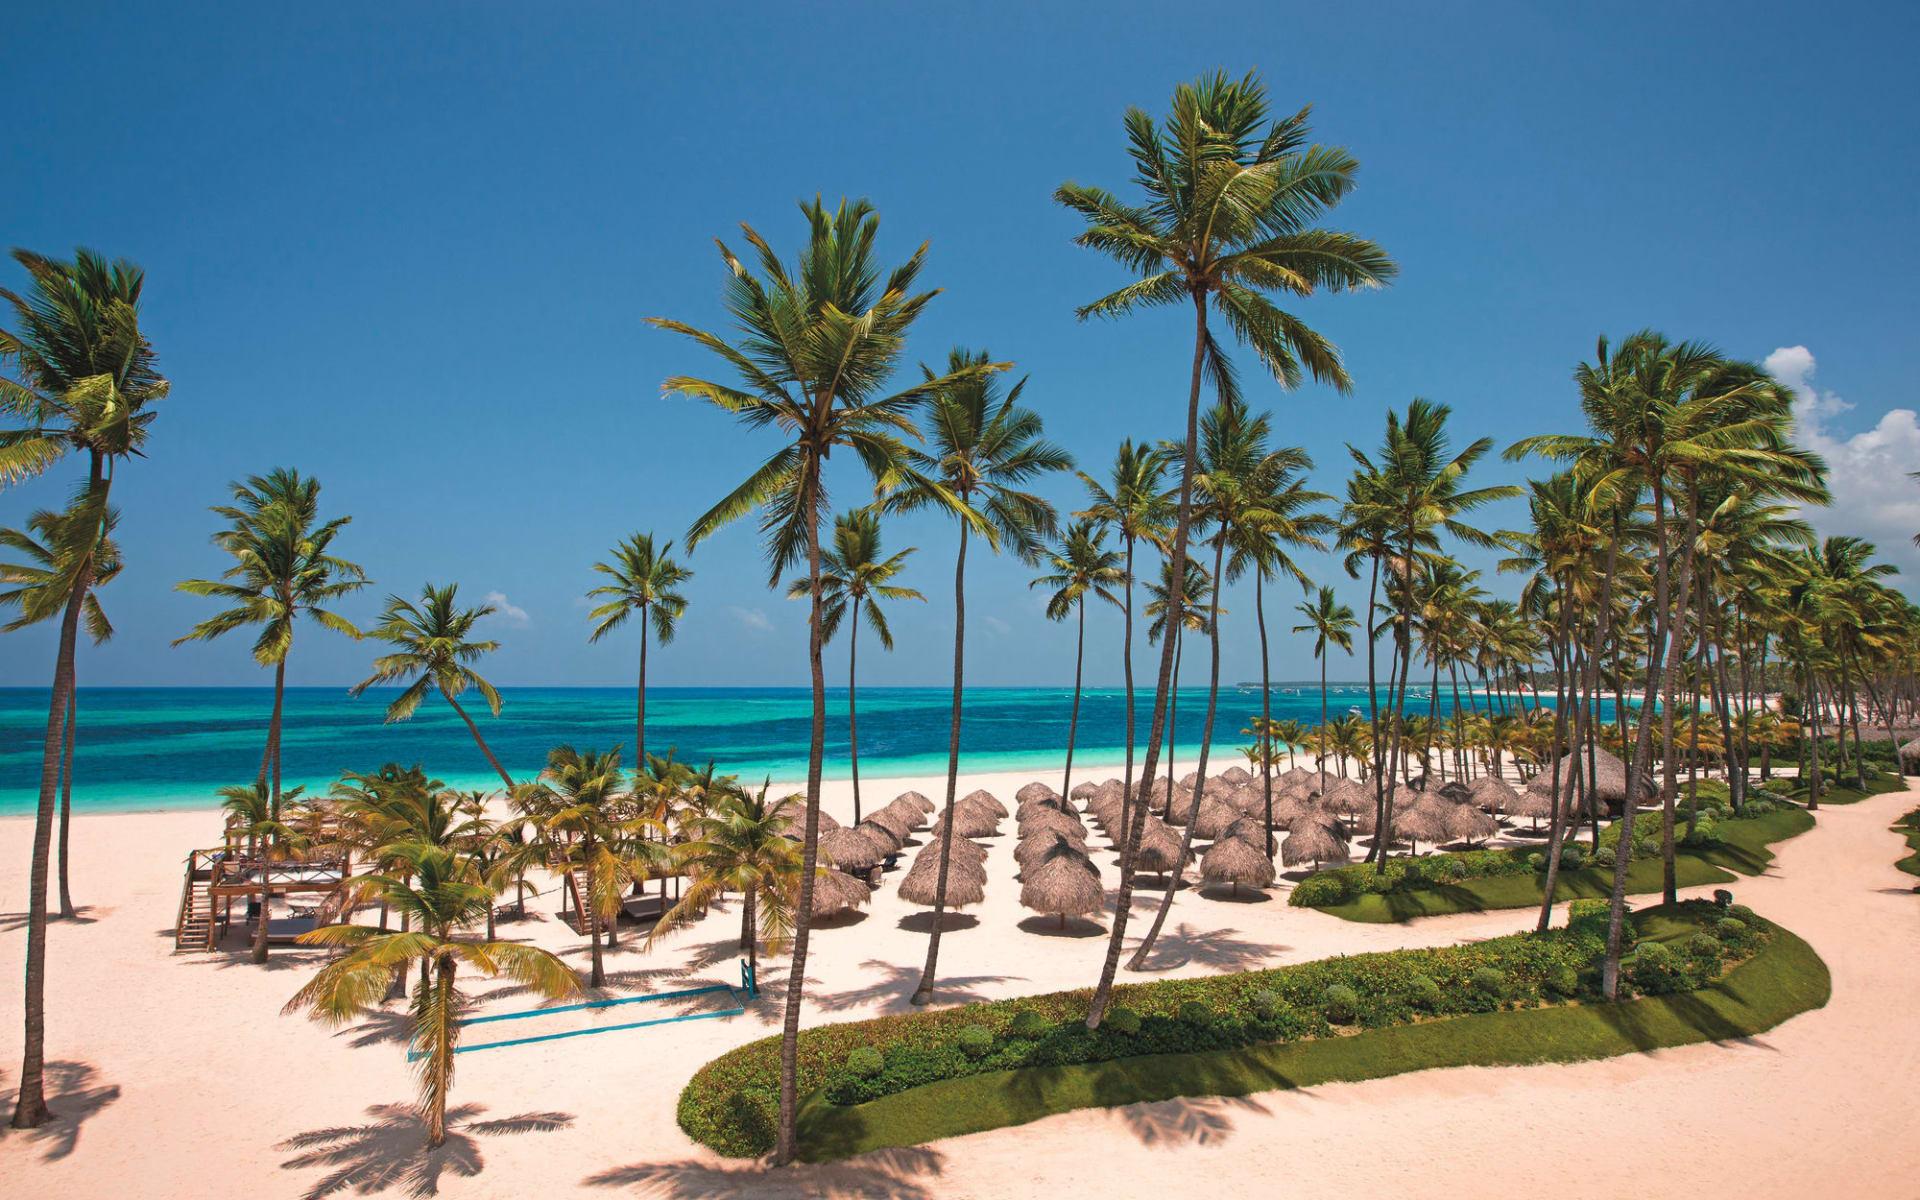 Secrets Royal Beach Punta Cana:  Secrets Royal Beach - Beach Latinconnect